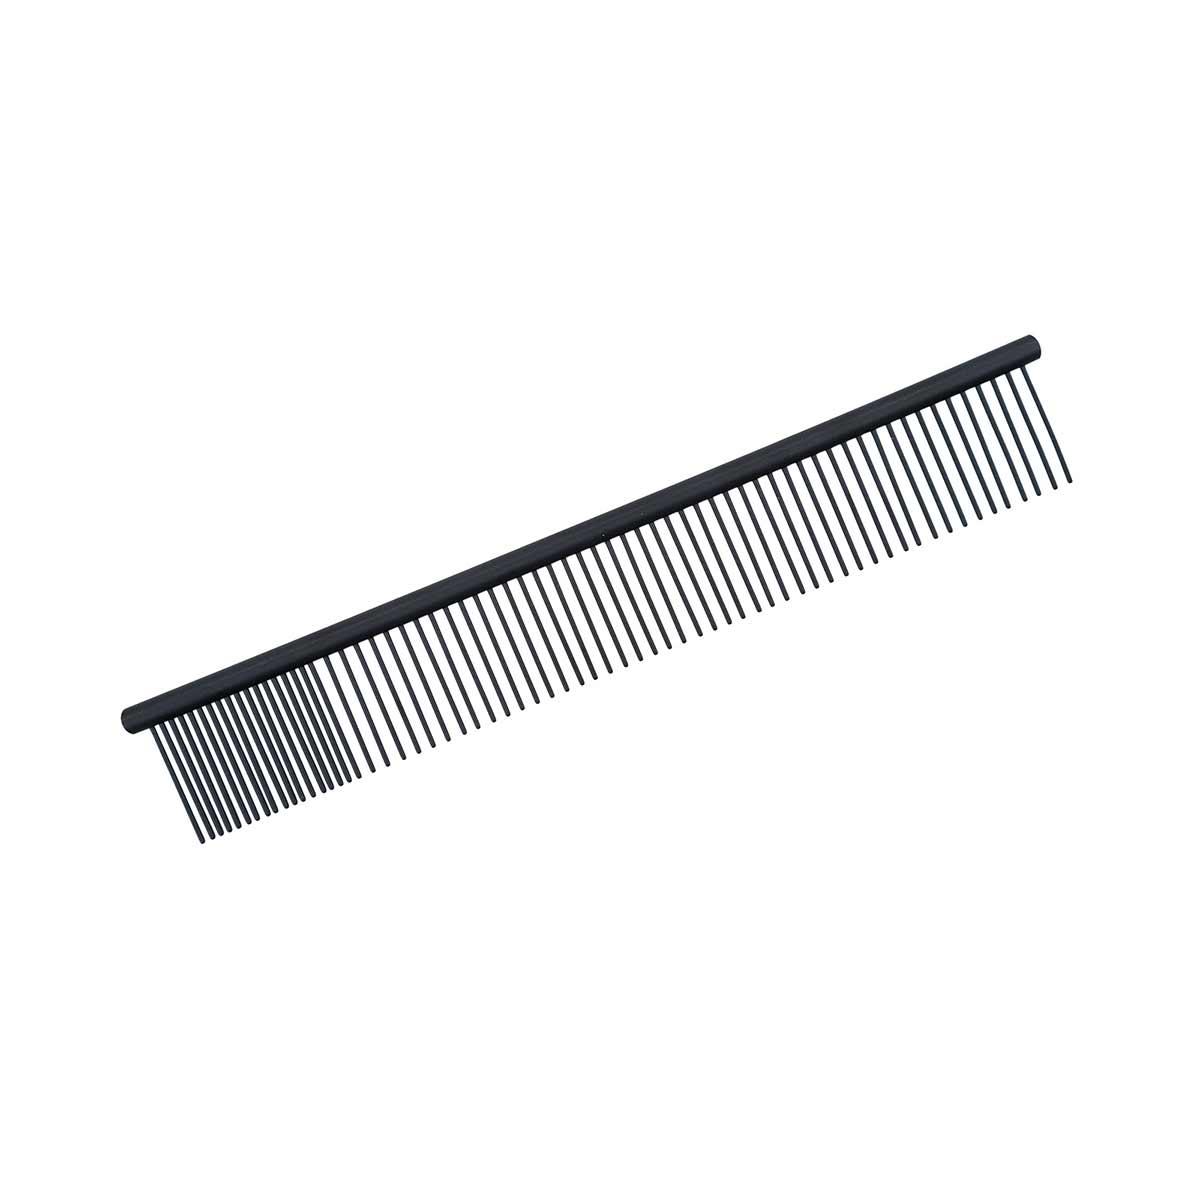 Blackworks X-Large Combo Comb